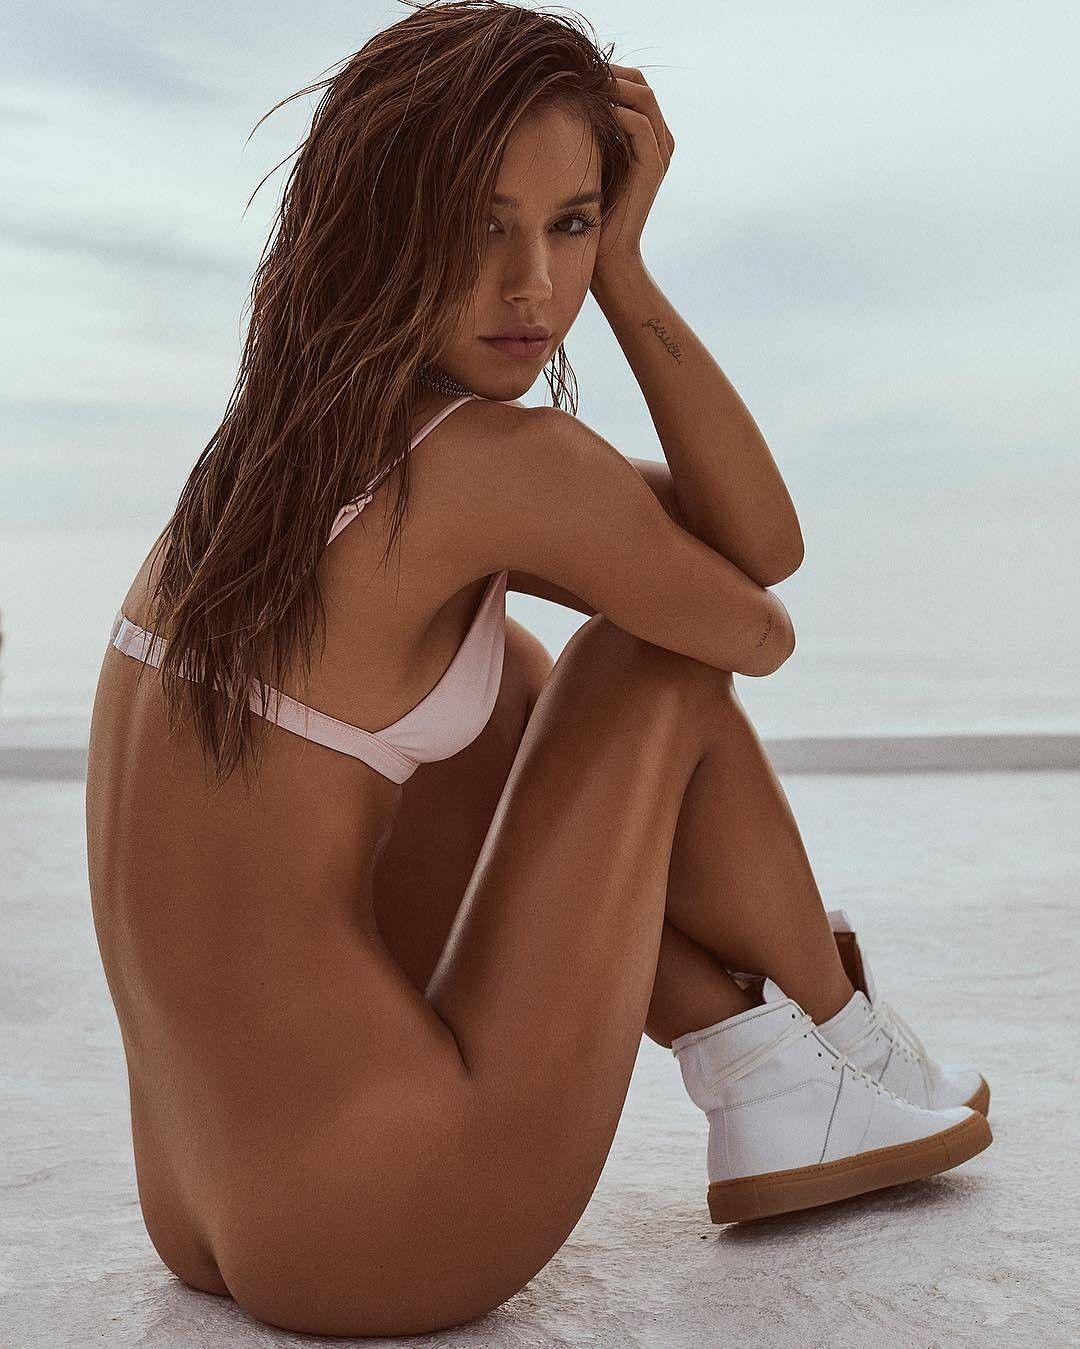 Dantes cove,Anne hathaway nude scene in havoc movie Sex videos Nipple photos of Kylie Jenner. 2018-2019 celebrityes photos leaks!,Jenny thompson bikini